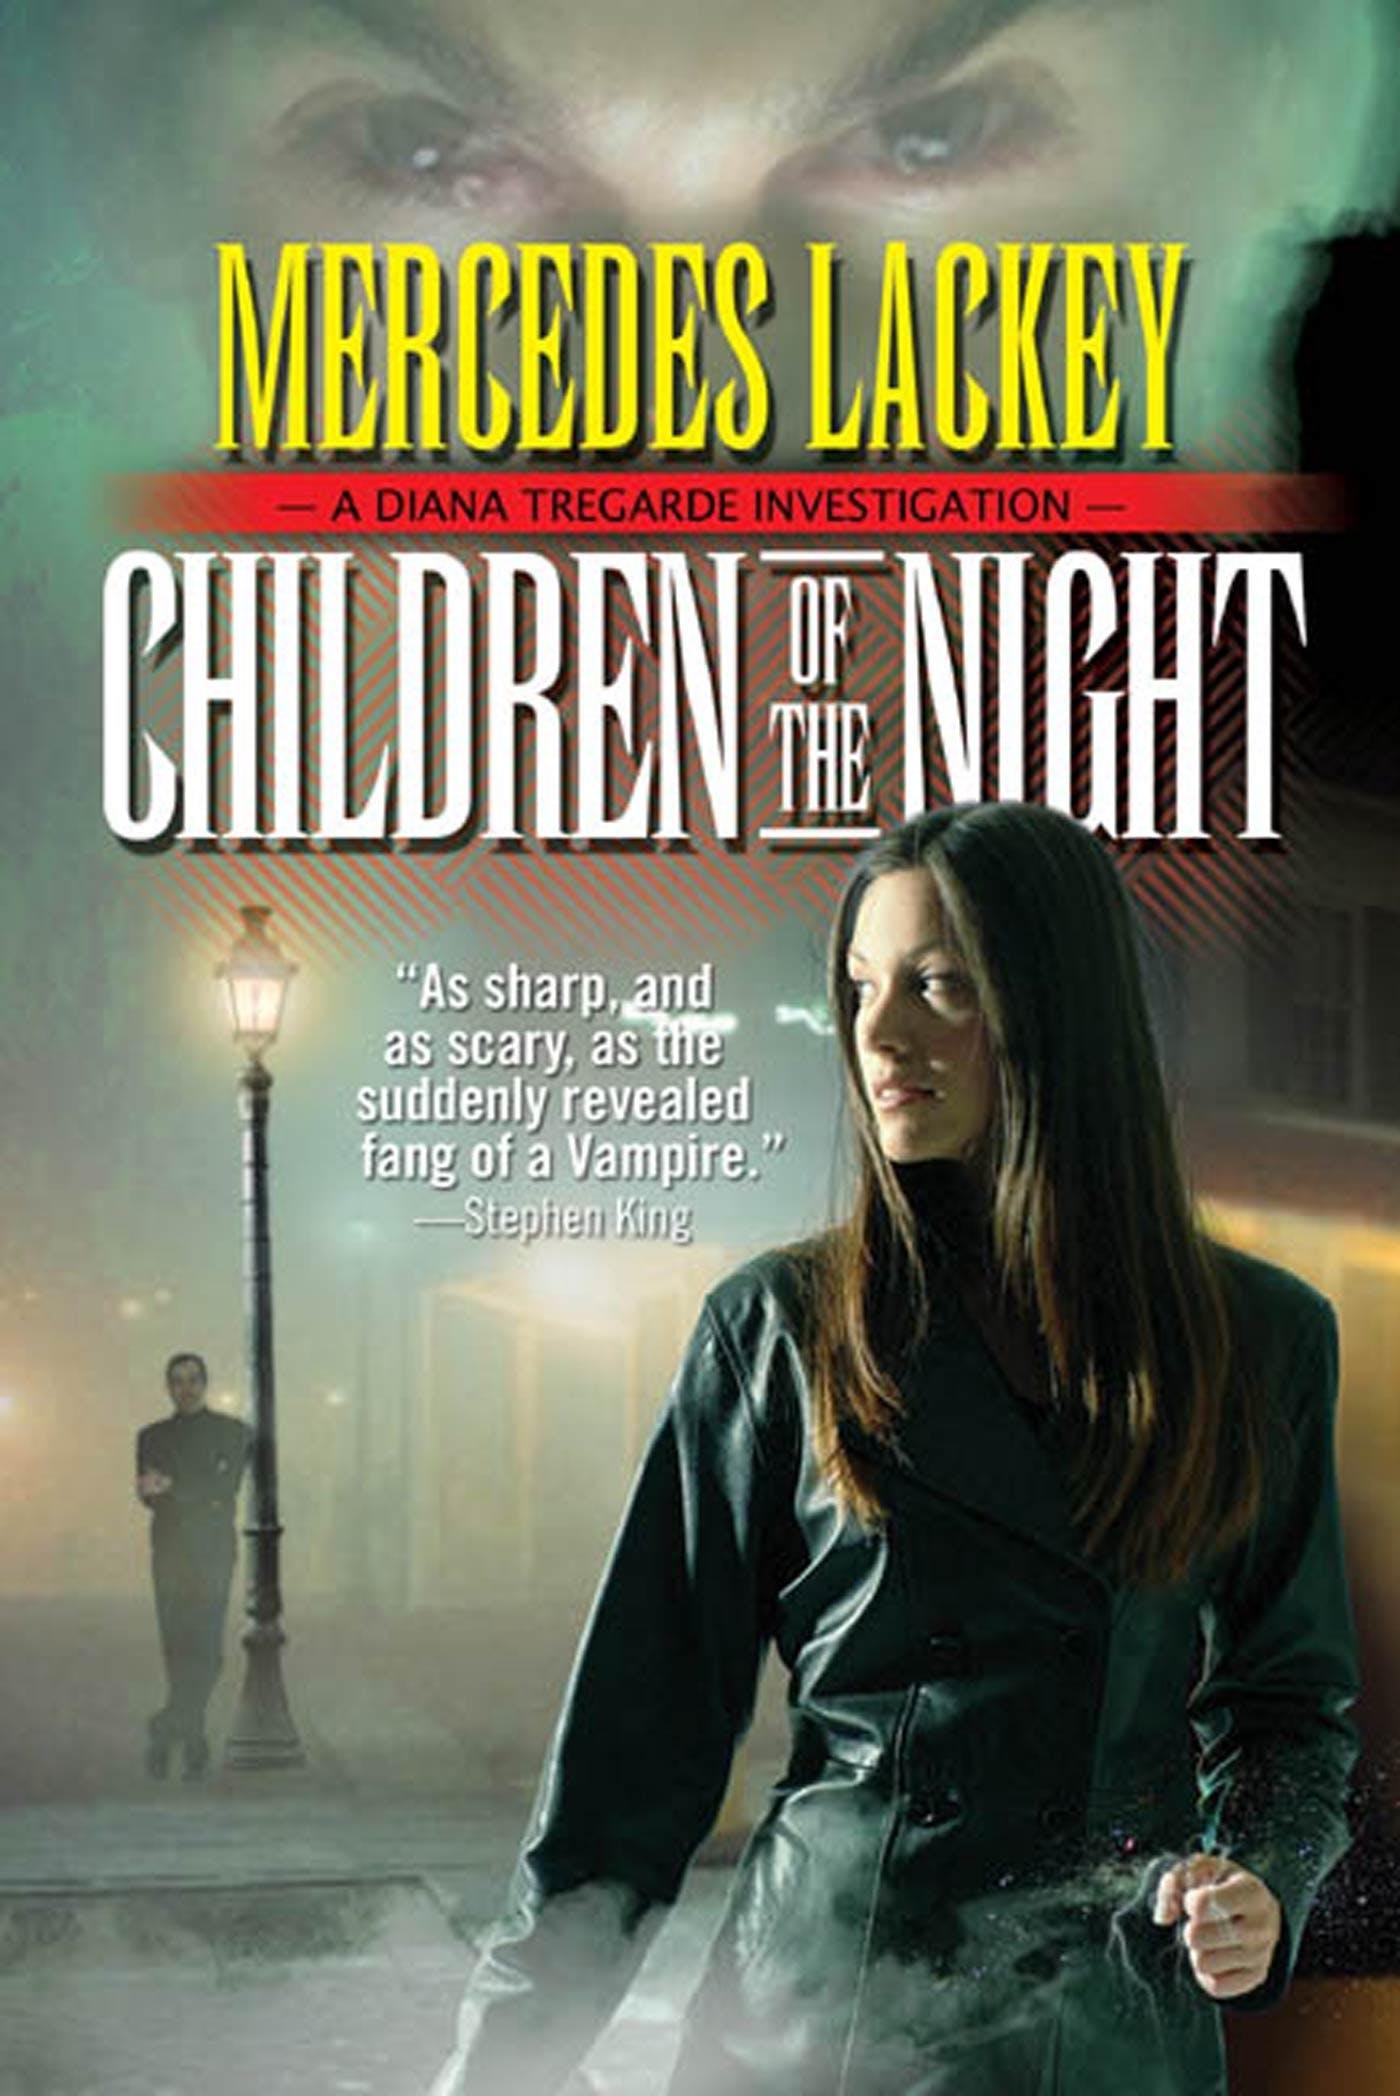 Image of Children of the Night